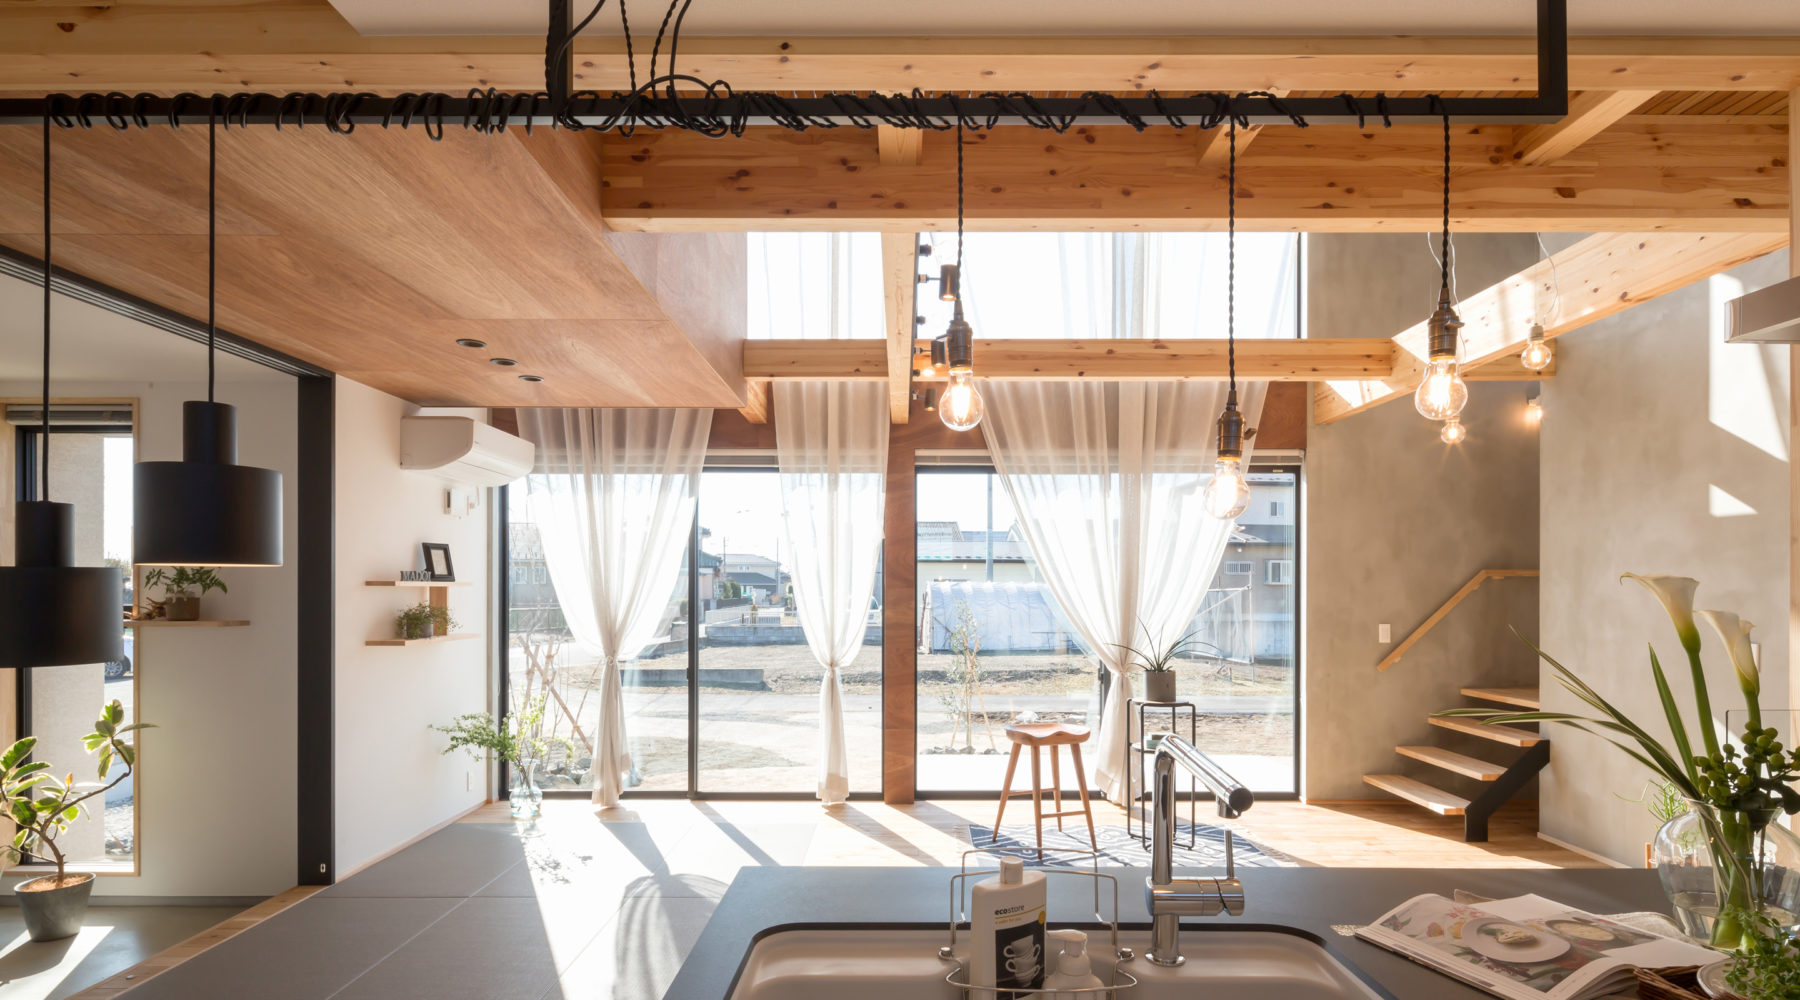 株式会社 建舎団居 STUDIO MADOI 蒲生の家 2021/1 竣工